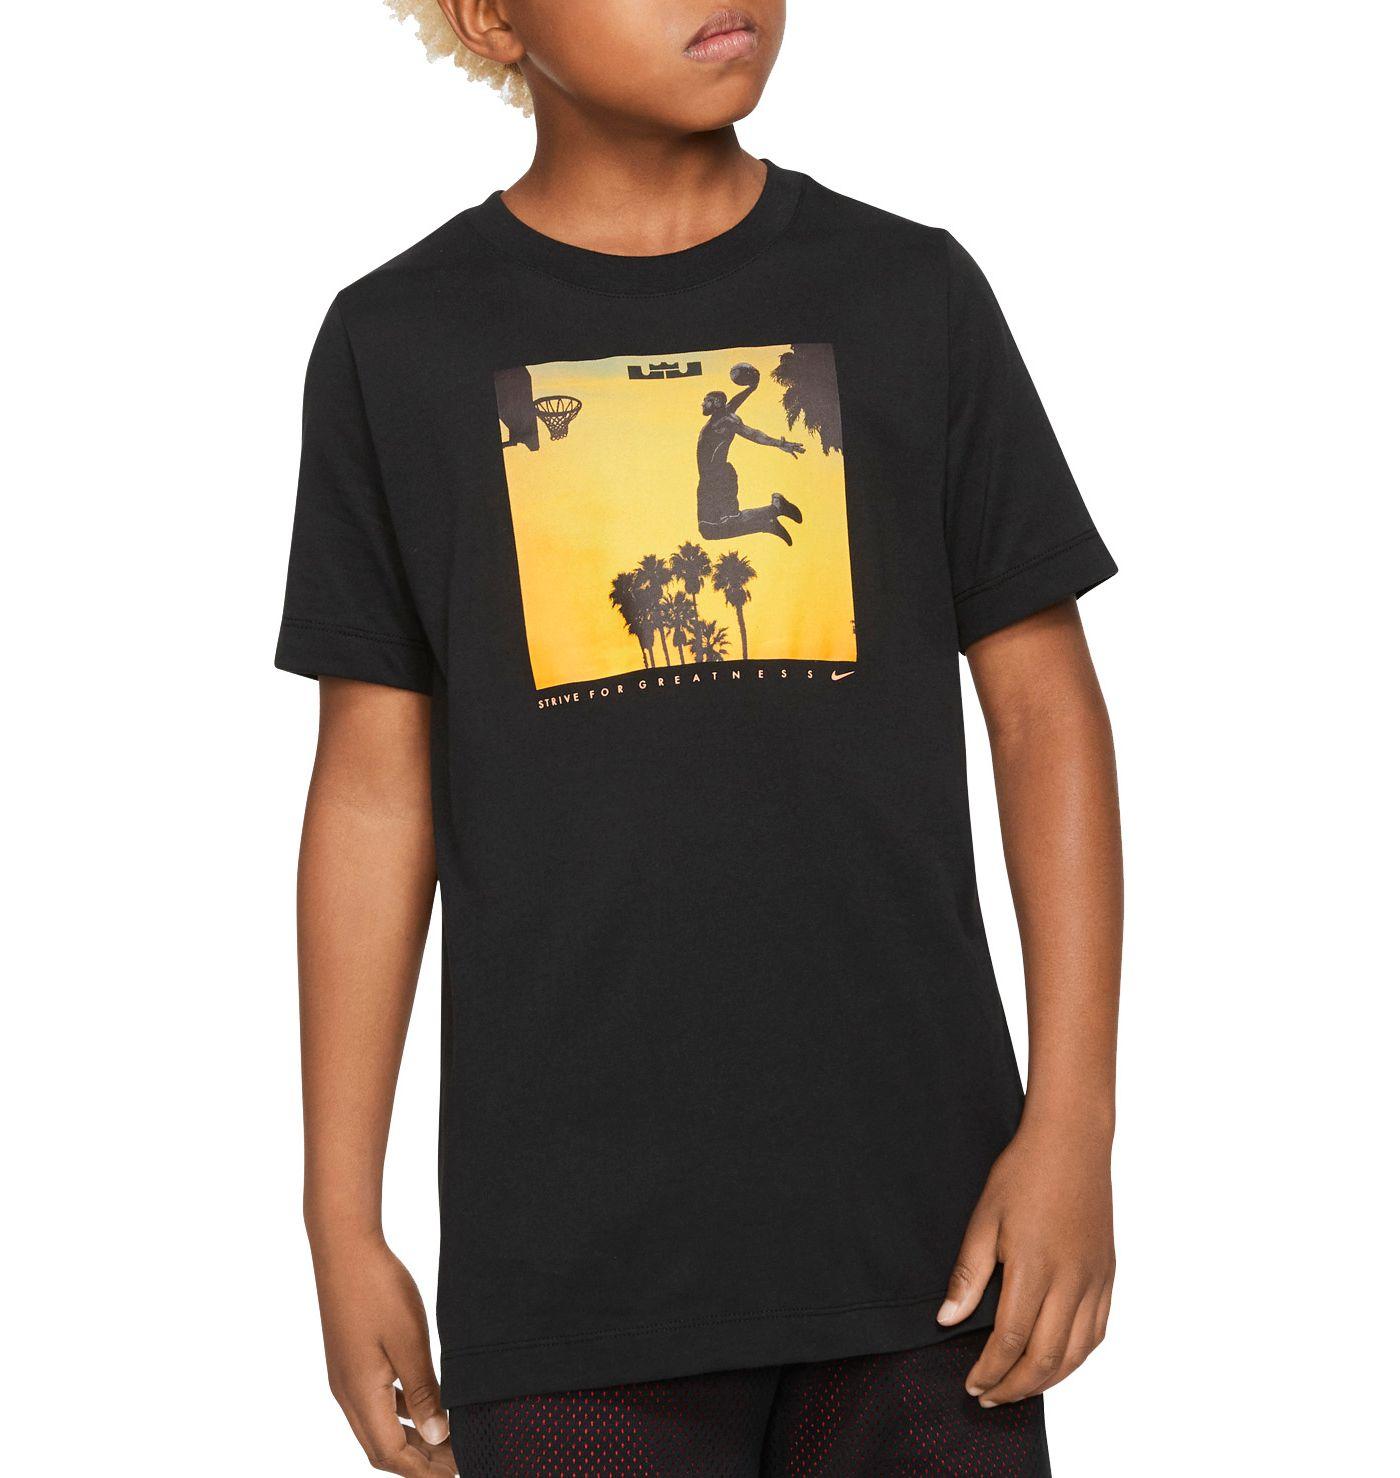 Nike Boys' Dri-FIT LBJ Sunset Dunk Graphic T-Shirt